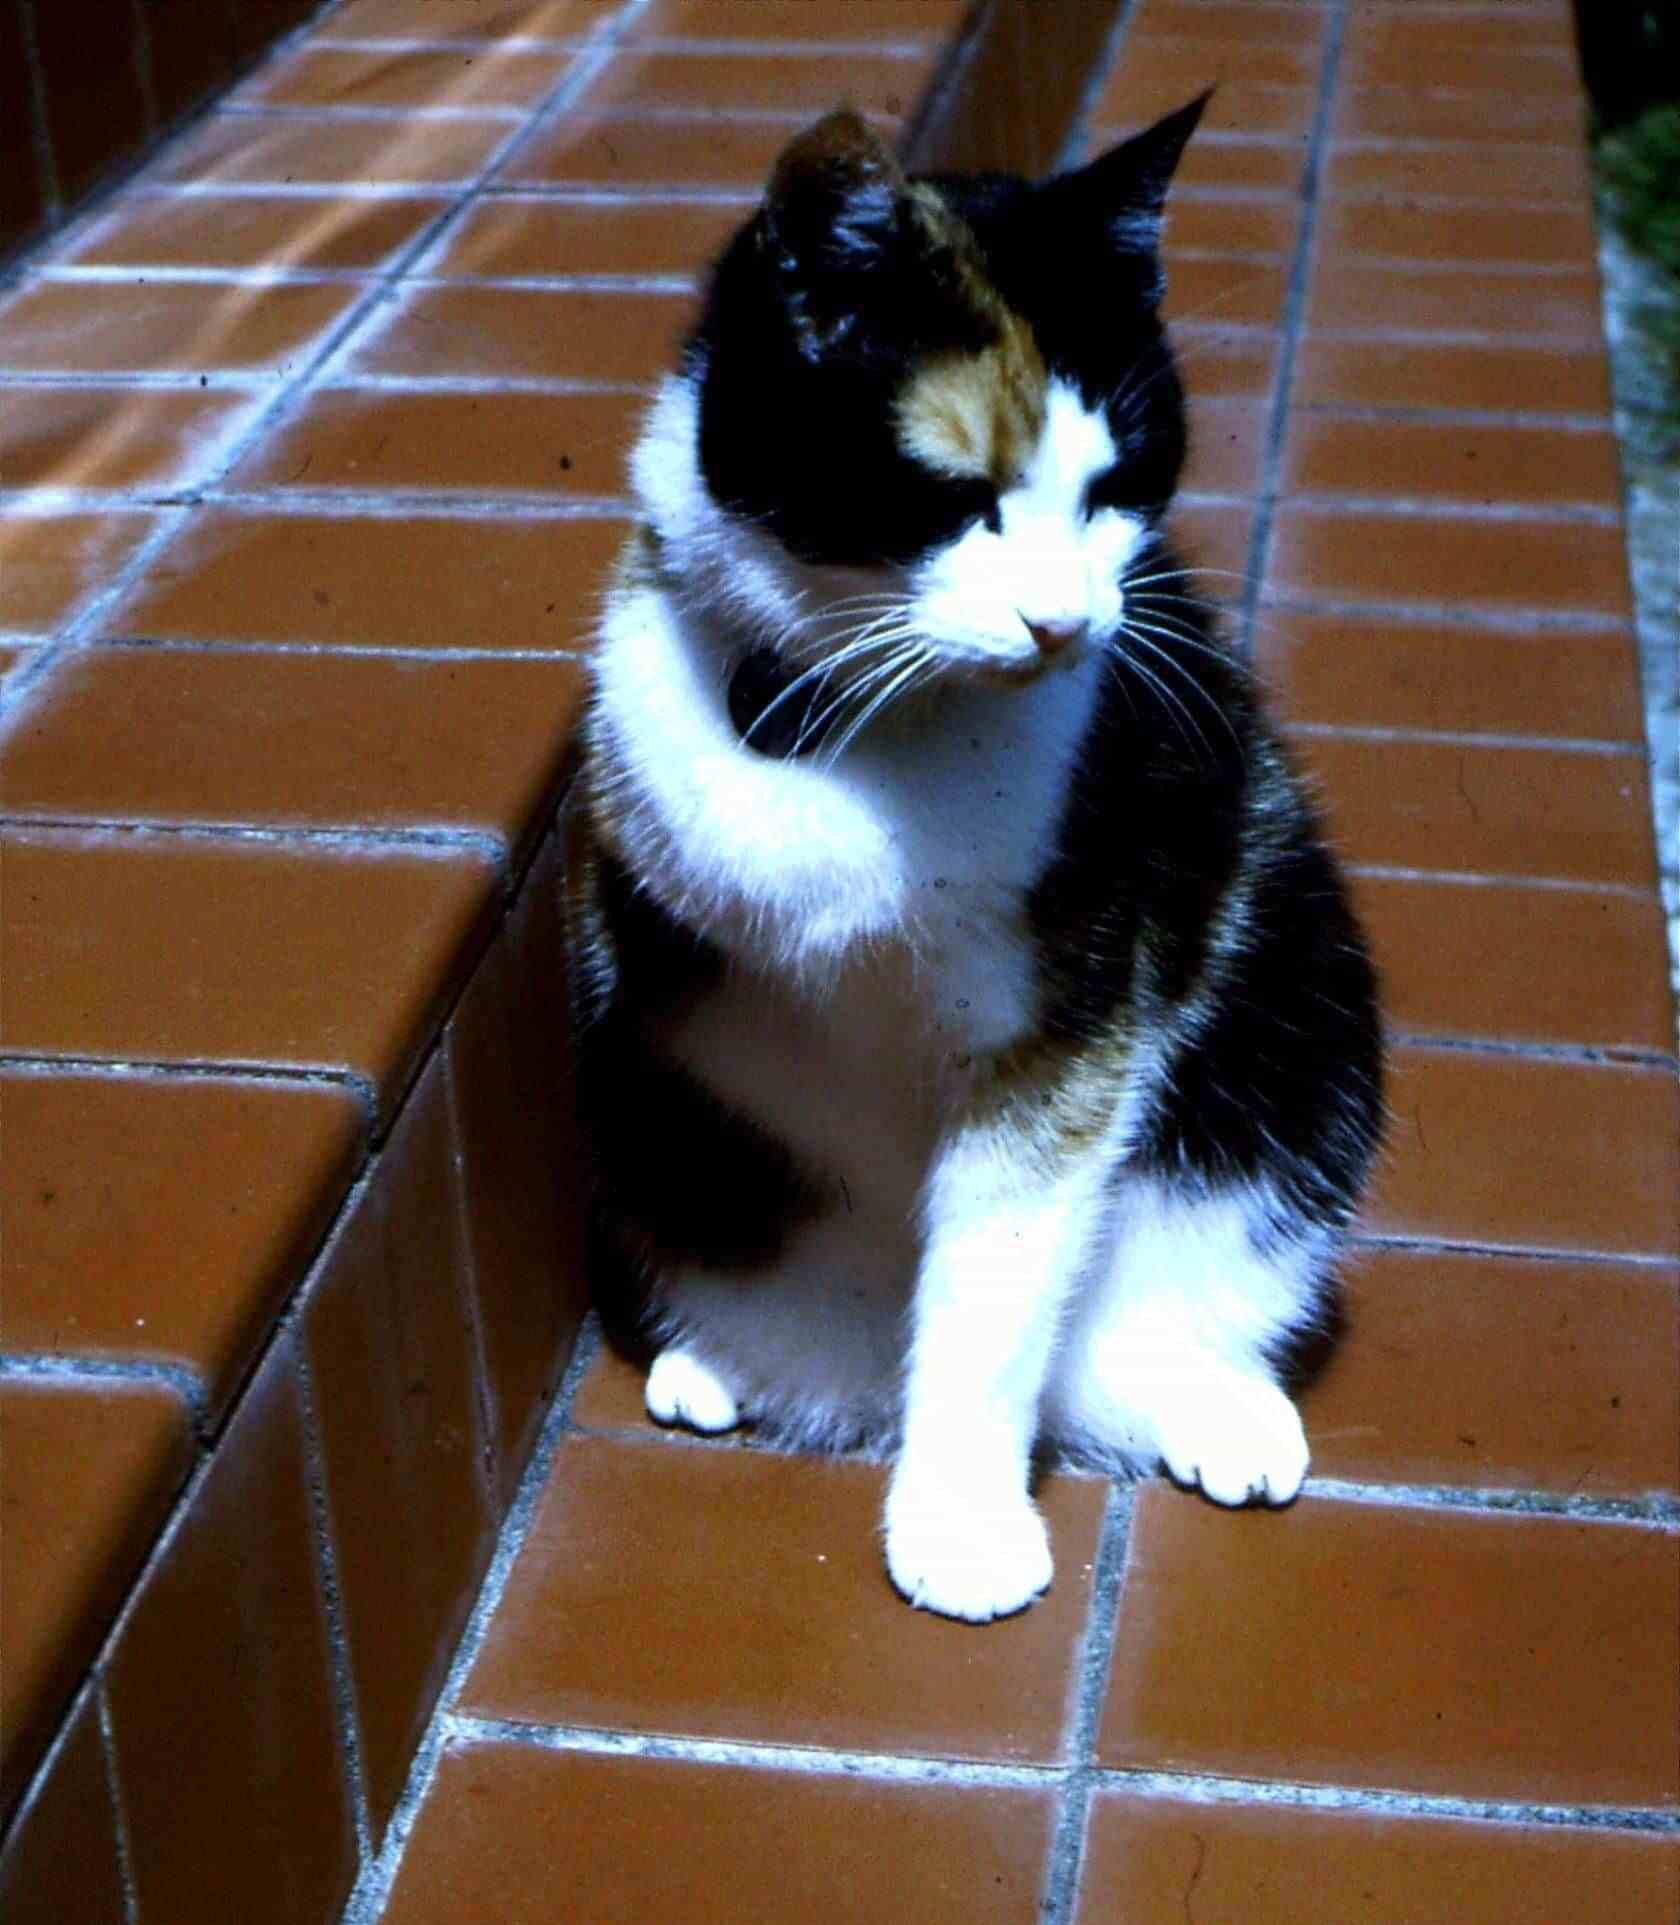 Three-Legged Cat Image